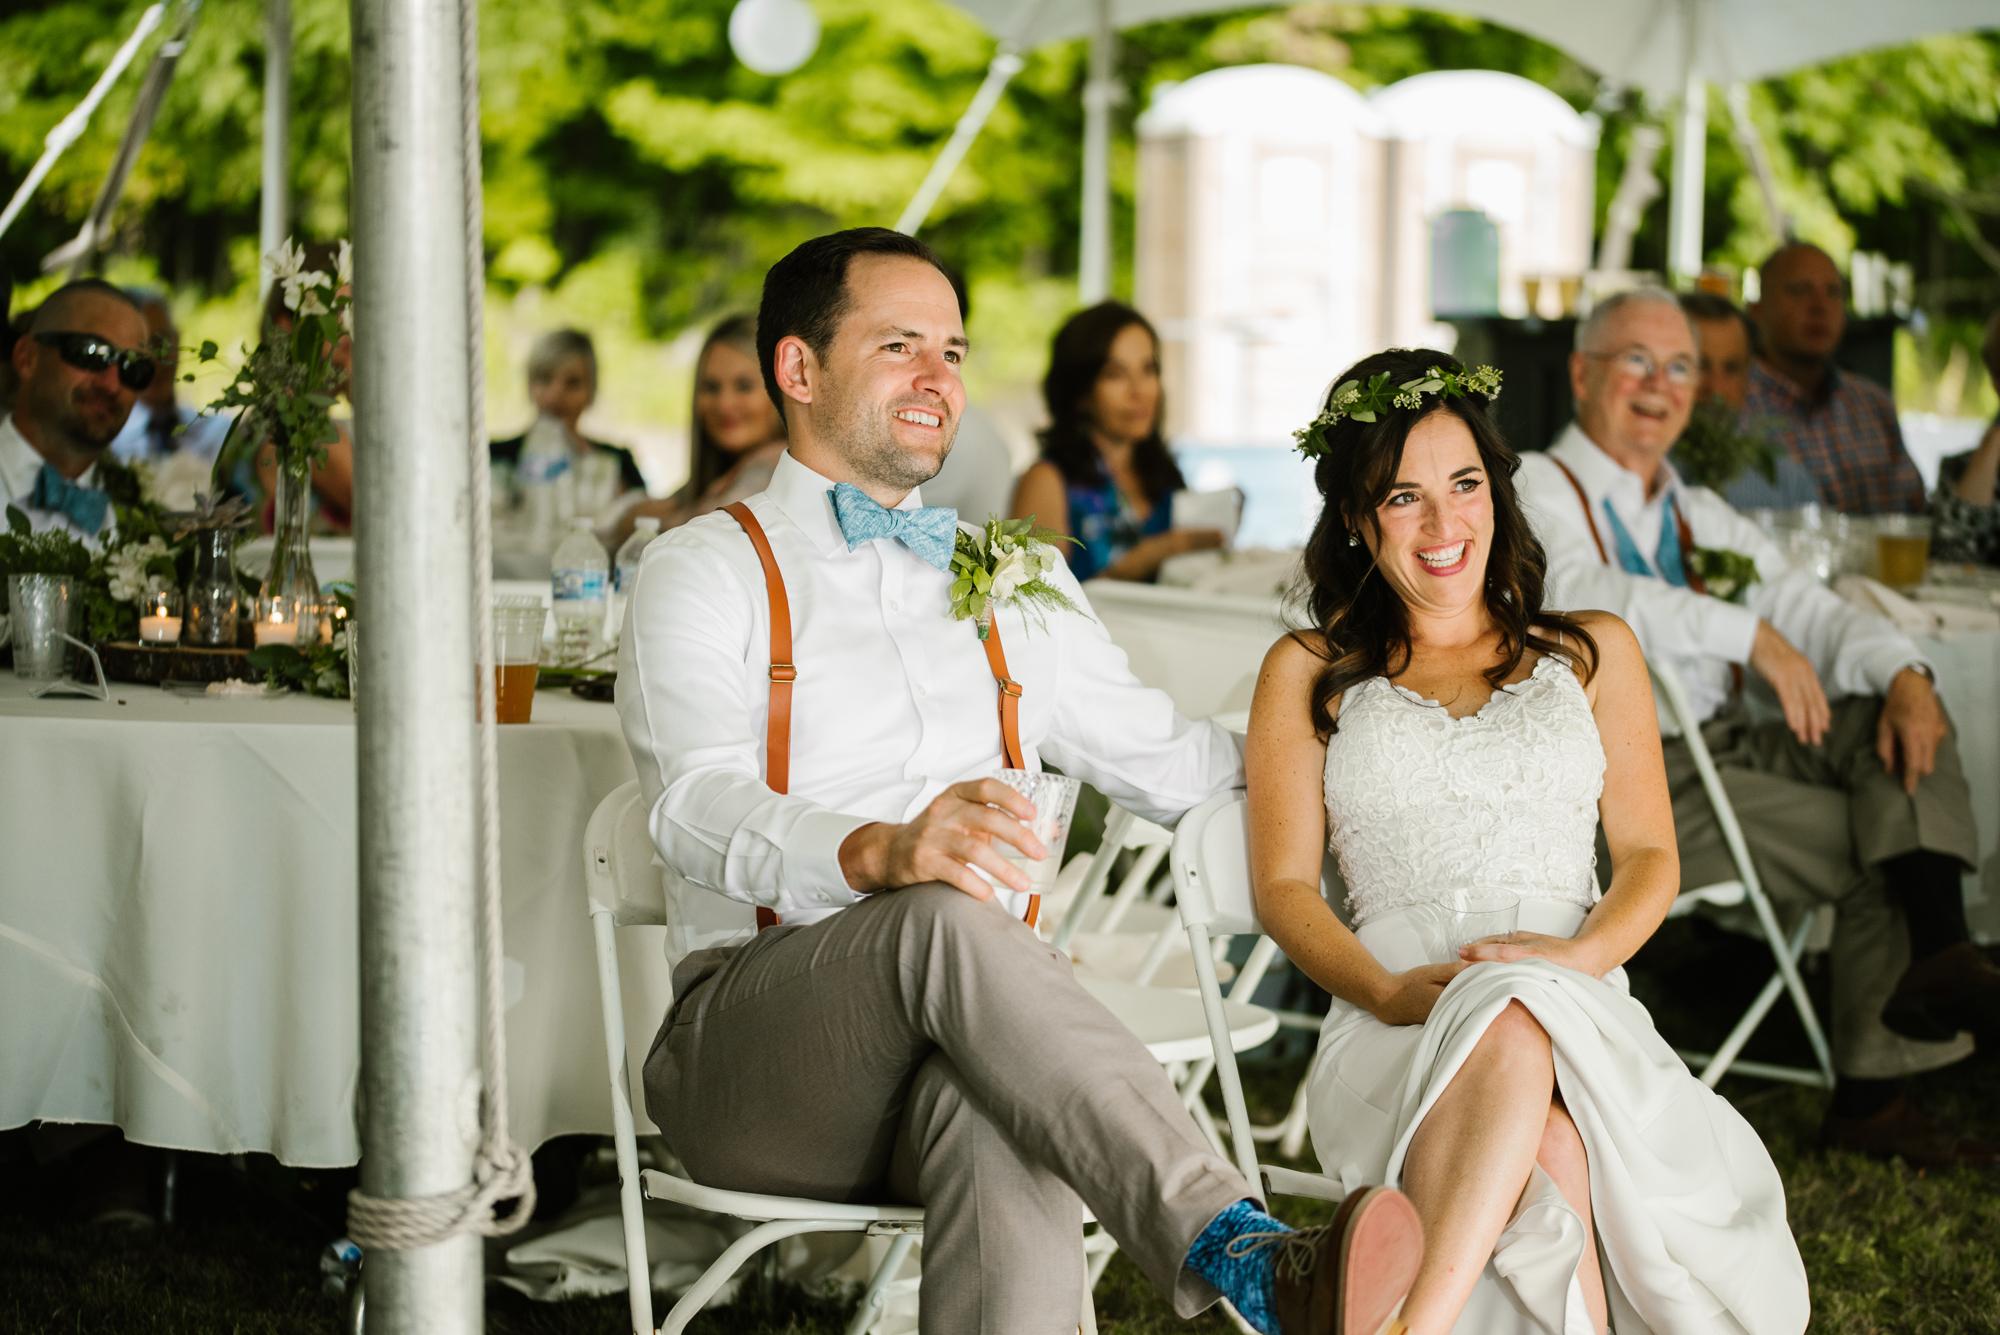 Quincy-Coldwater-Michigan-farm-wedding-photogapher-sydney-marie (437).jpg